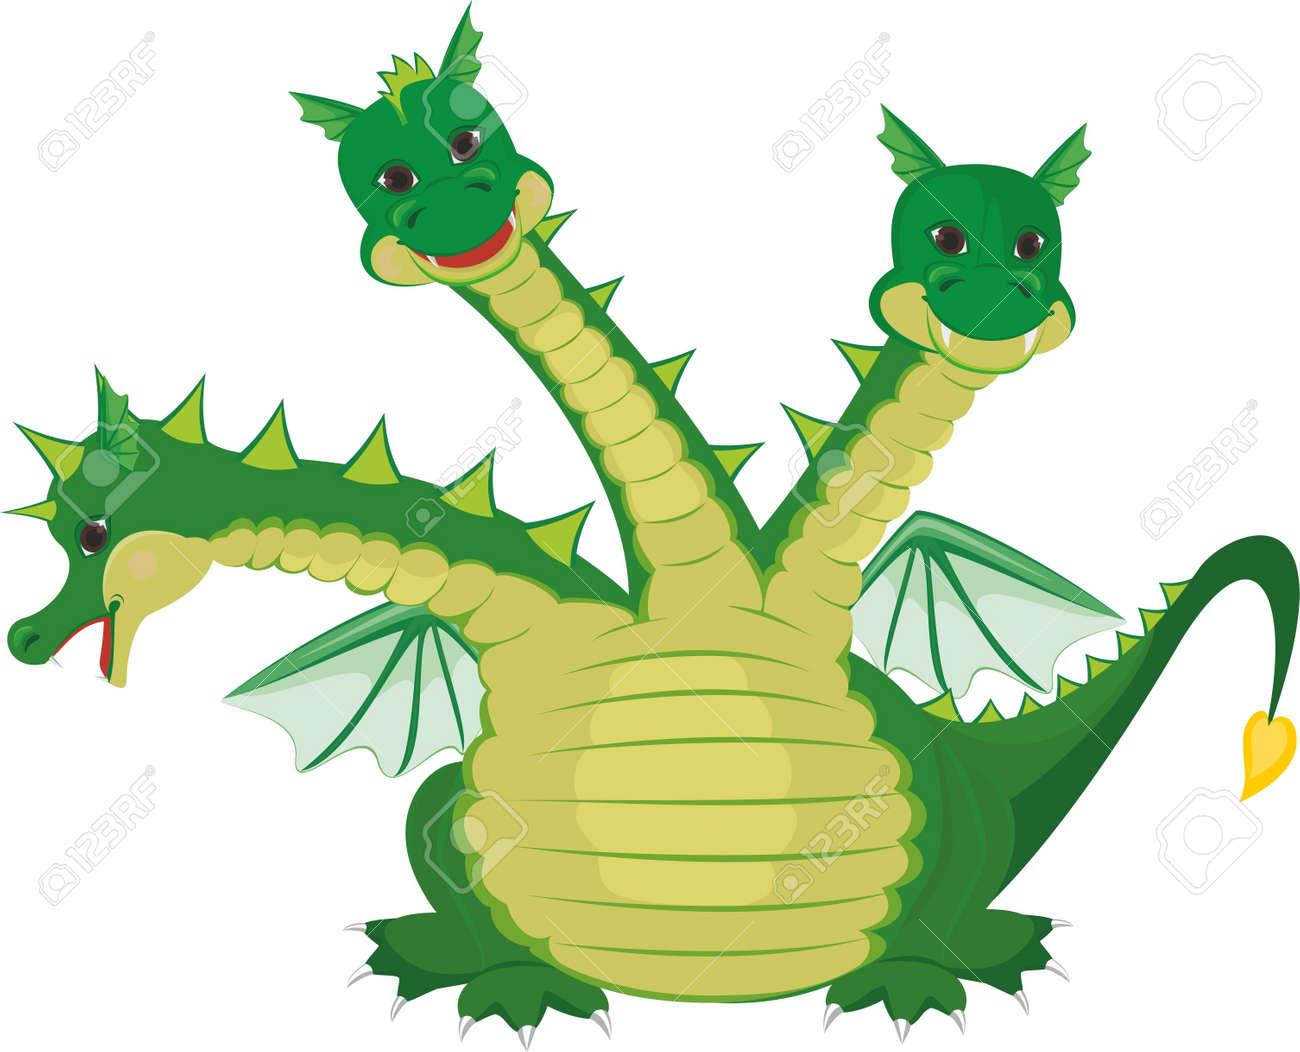 Cute Three Headed Dragon Royalty Free Cliparts, Vectors, And Stock ...